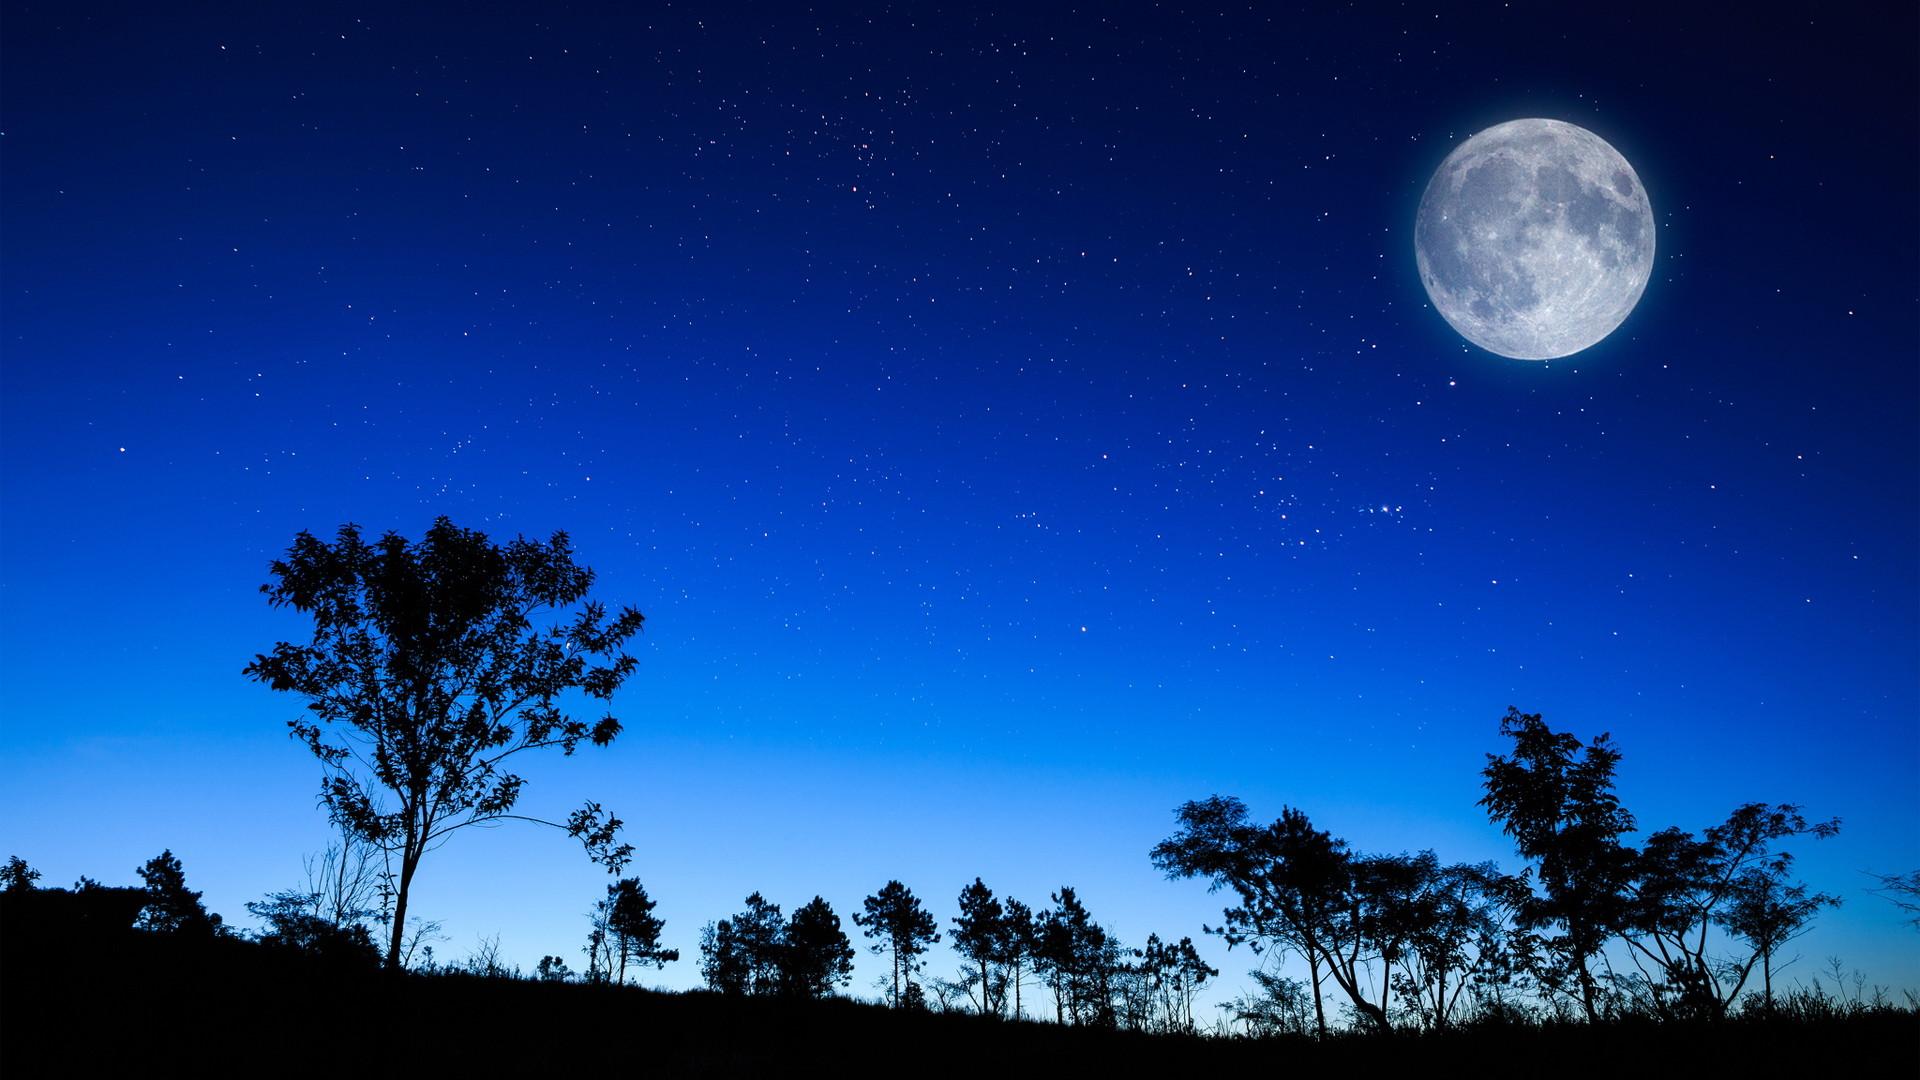 fire, full moon, night, river, wood, island, art, painting | HD wallpapers  | Pinterest | Full moon night